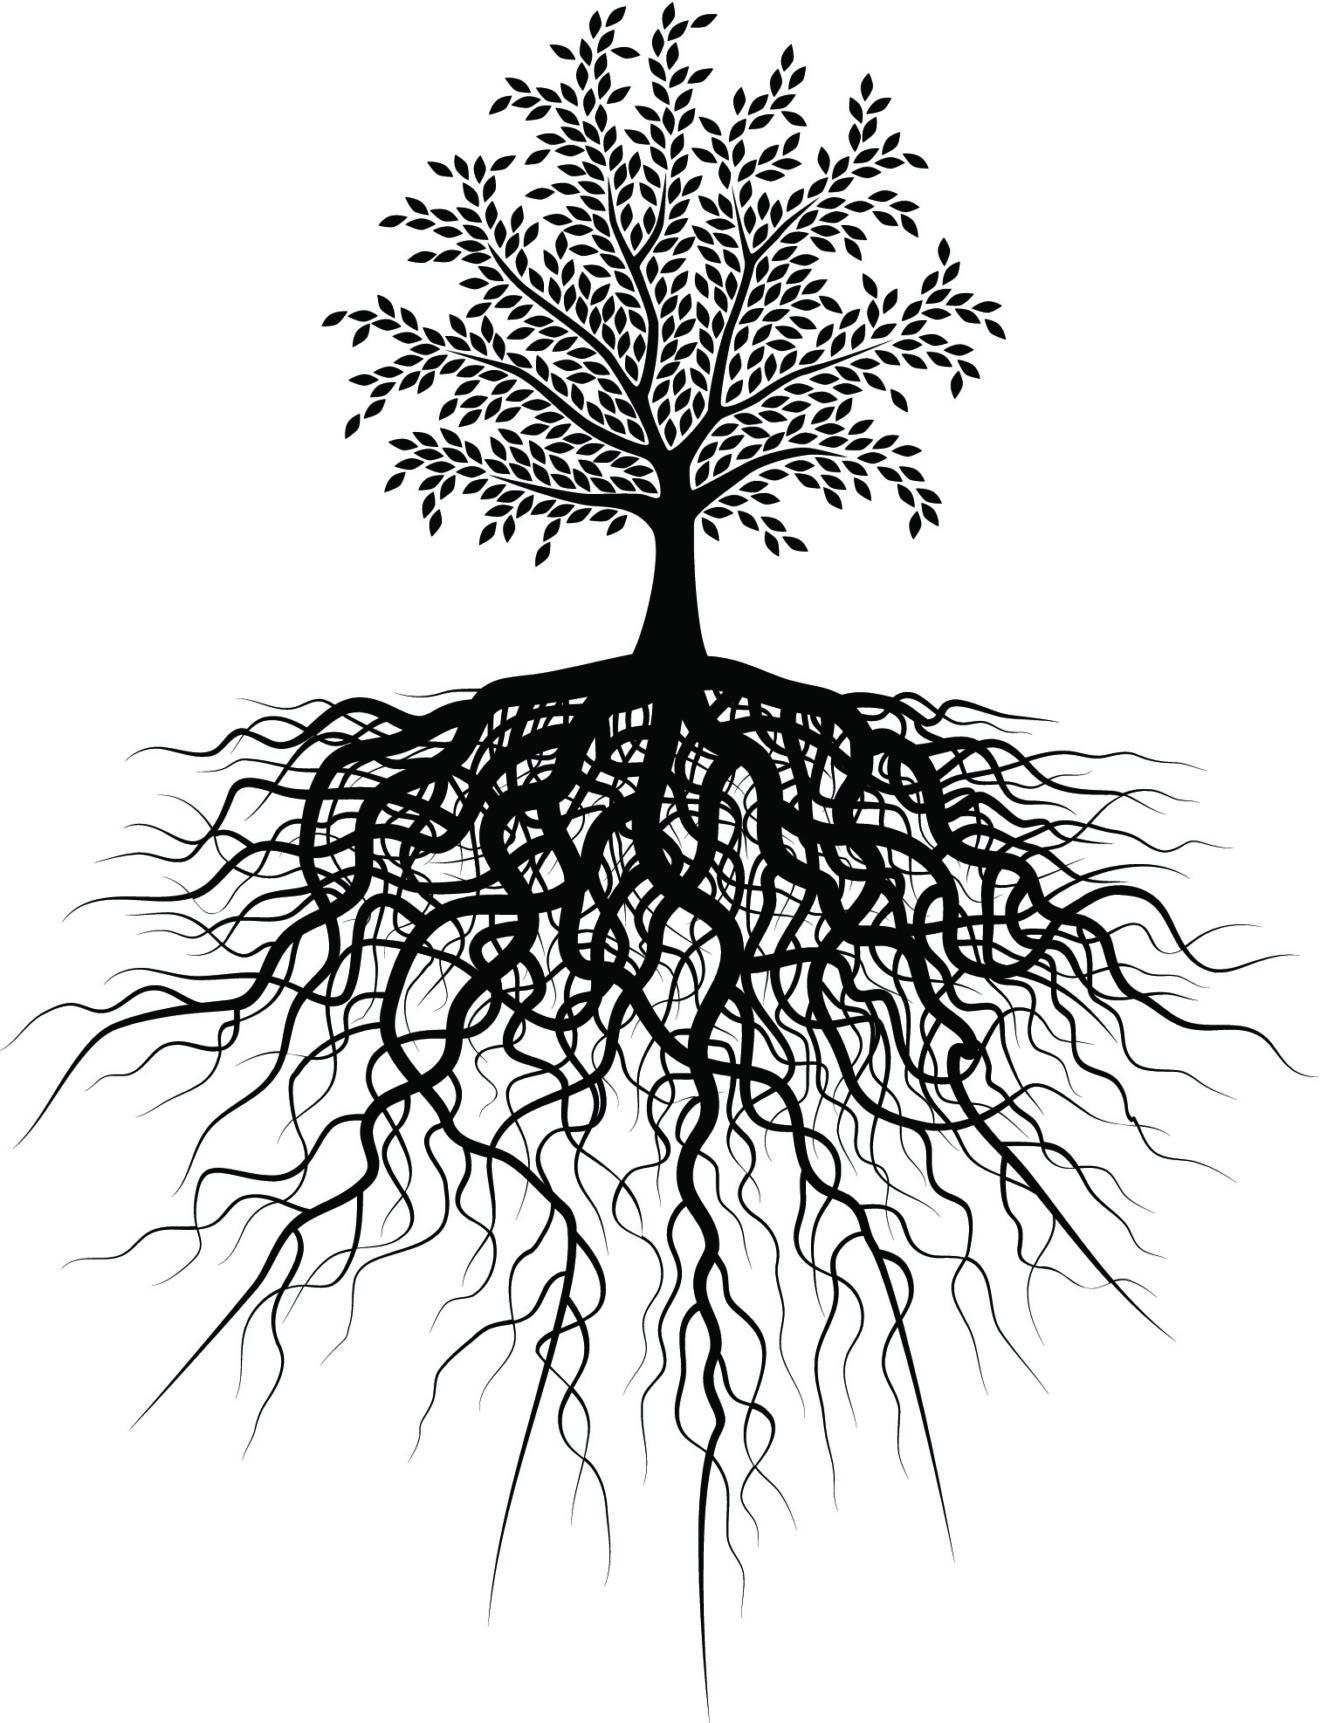 tree-big-roots